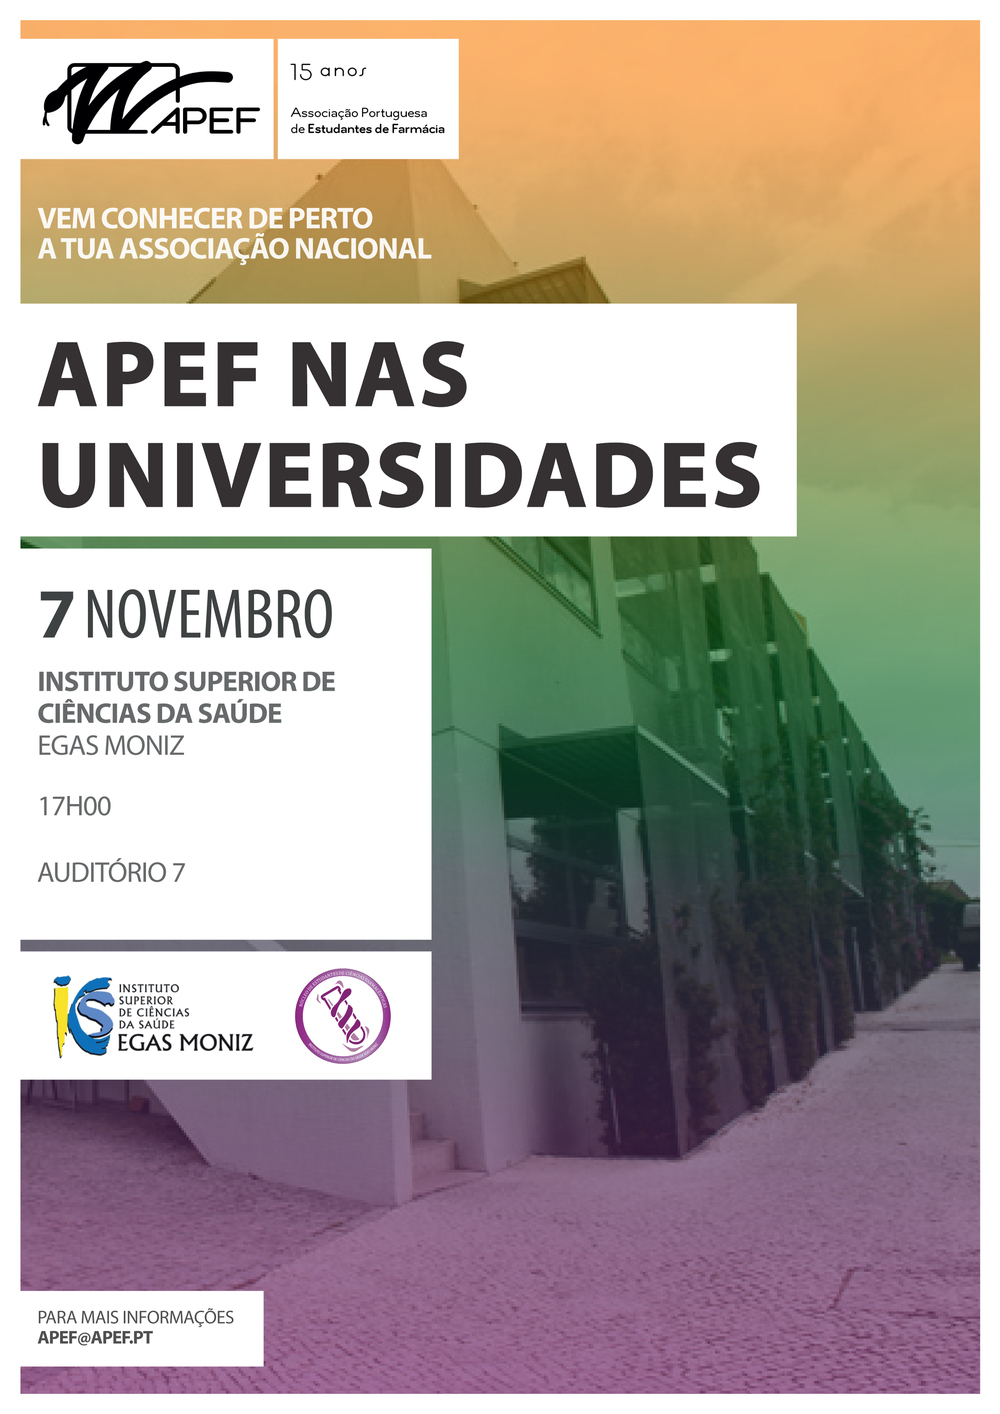 APEF nas Universidades - Egas Moniz.jpg